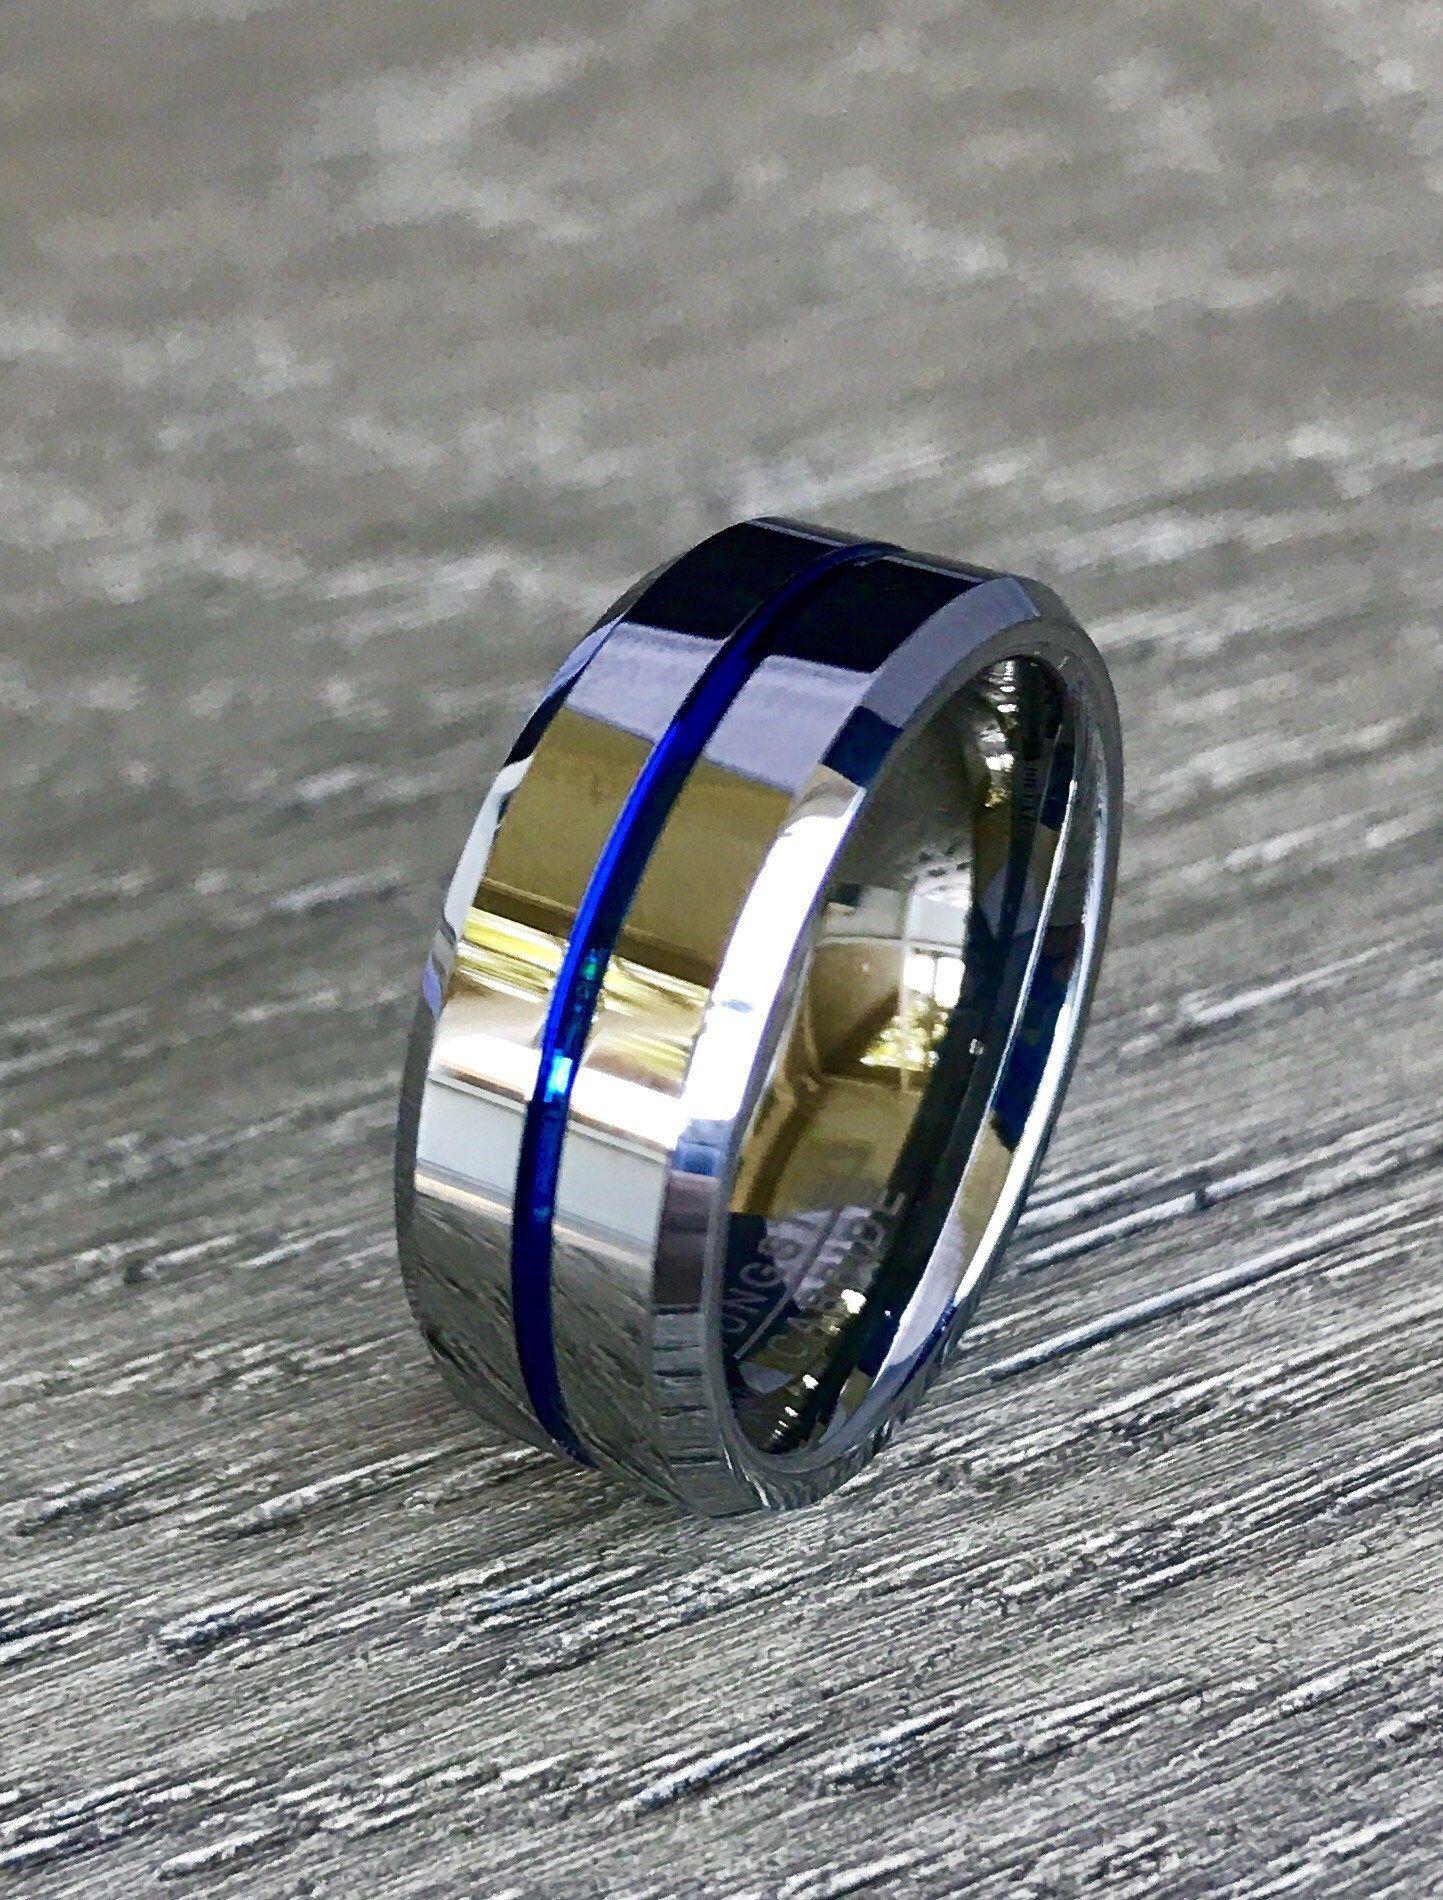 8mm Silver Tungsten Carbide Wedding Band with Blue Line